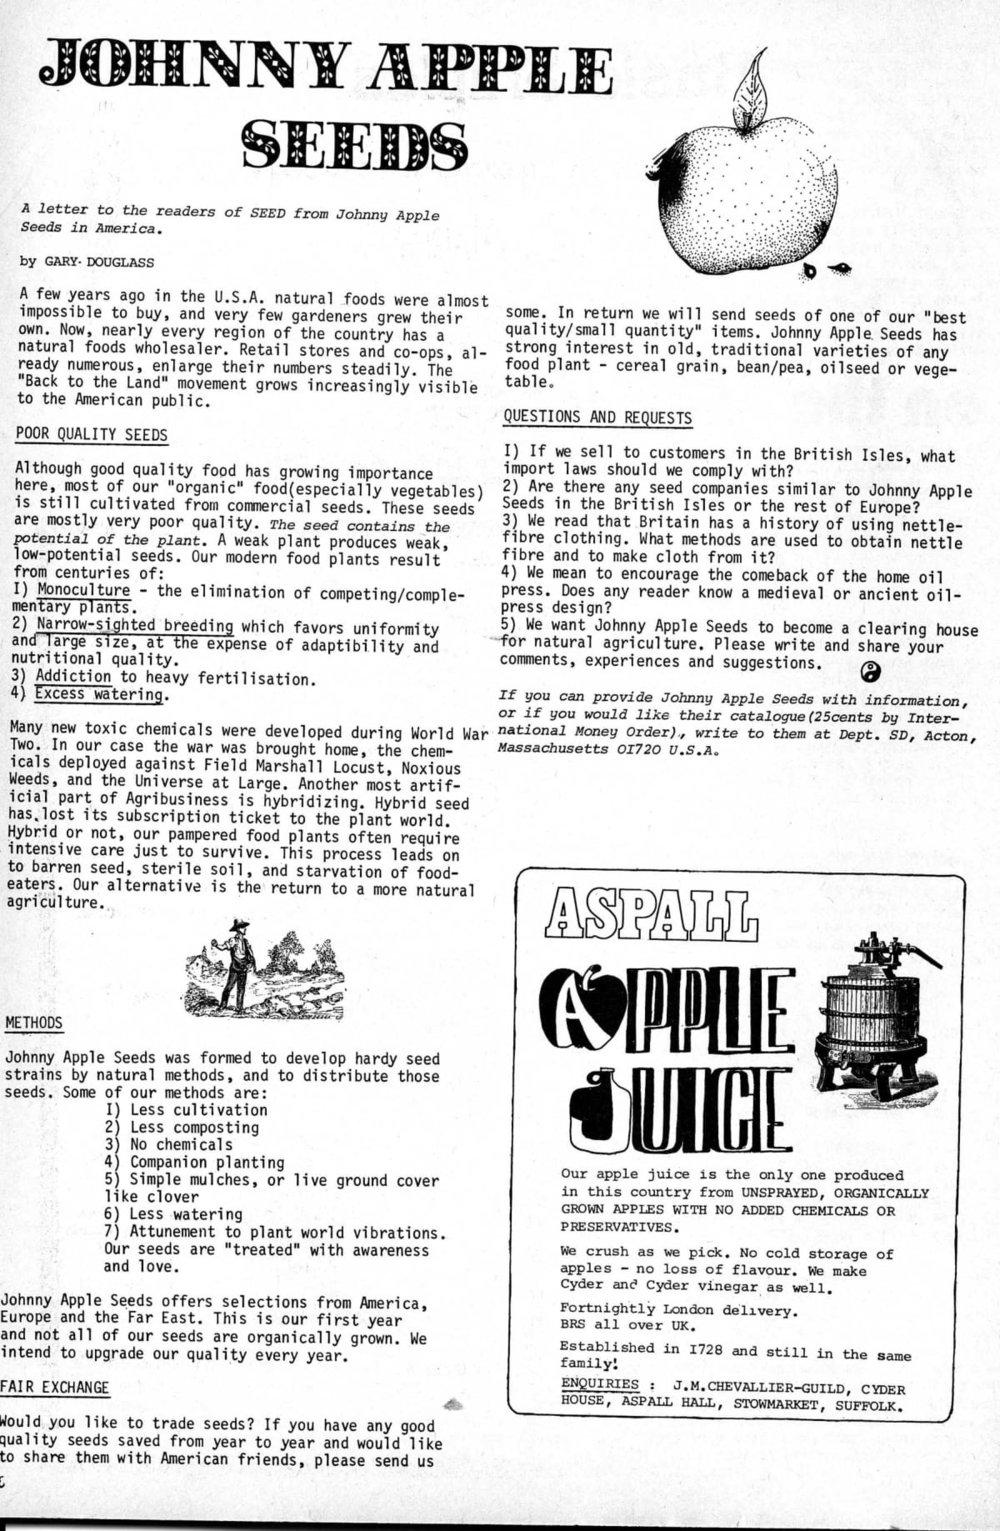 seed-v3-n5-may1974-06.jpg